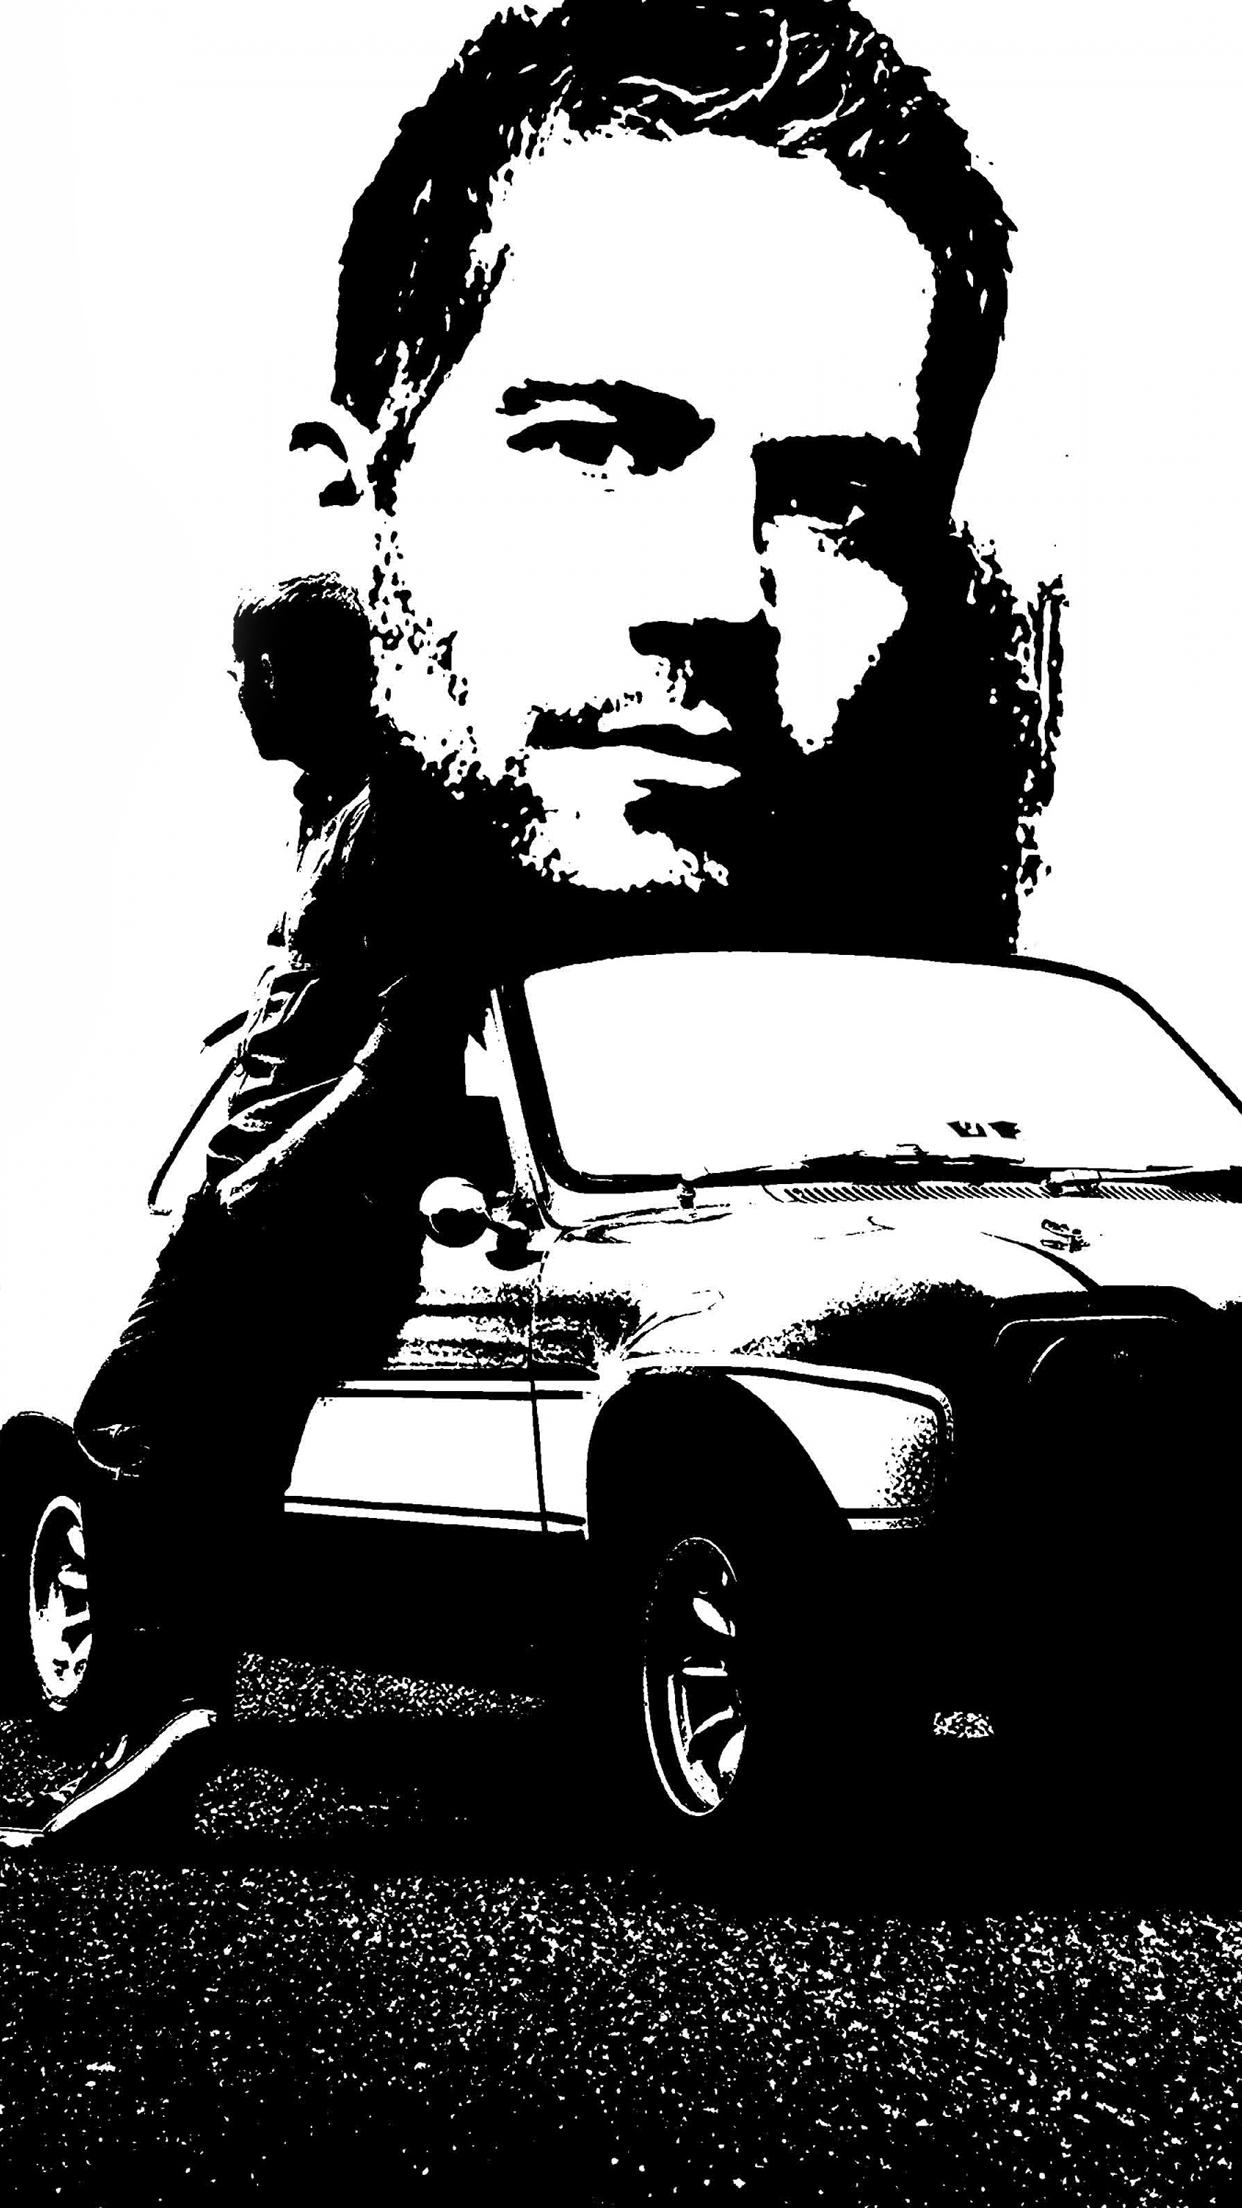 fast furious paul walker iphone parallax 3wallpapers les 3 wallpapers - Fast And Furious 7 Cars Iphone Wallpapers